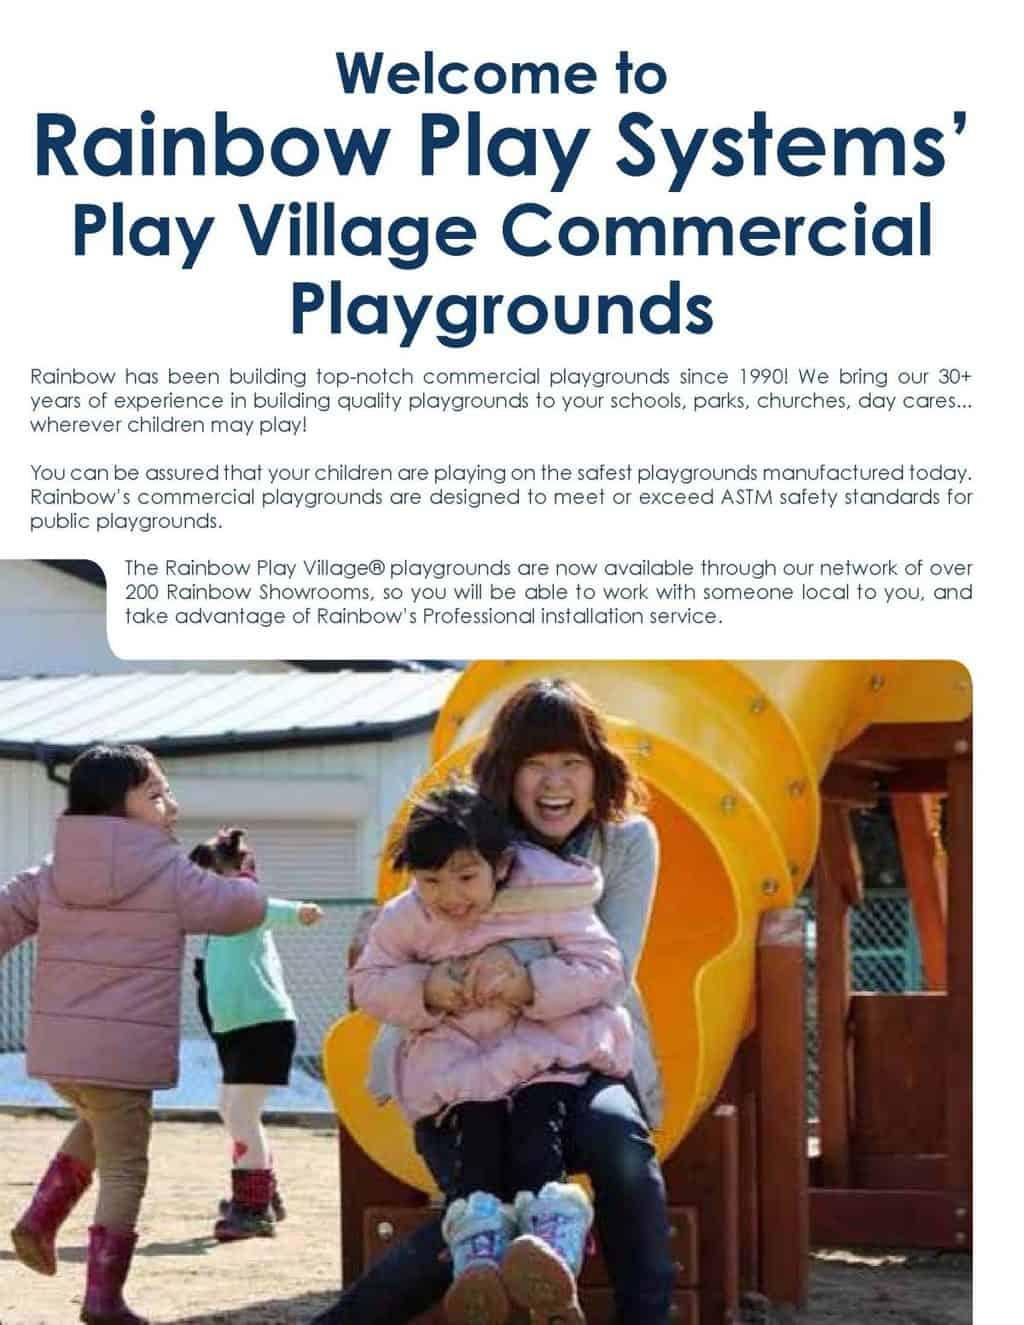 Rainbow Play Village Design 303 (19)